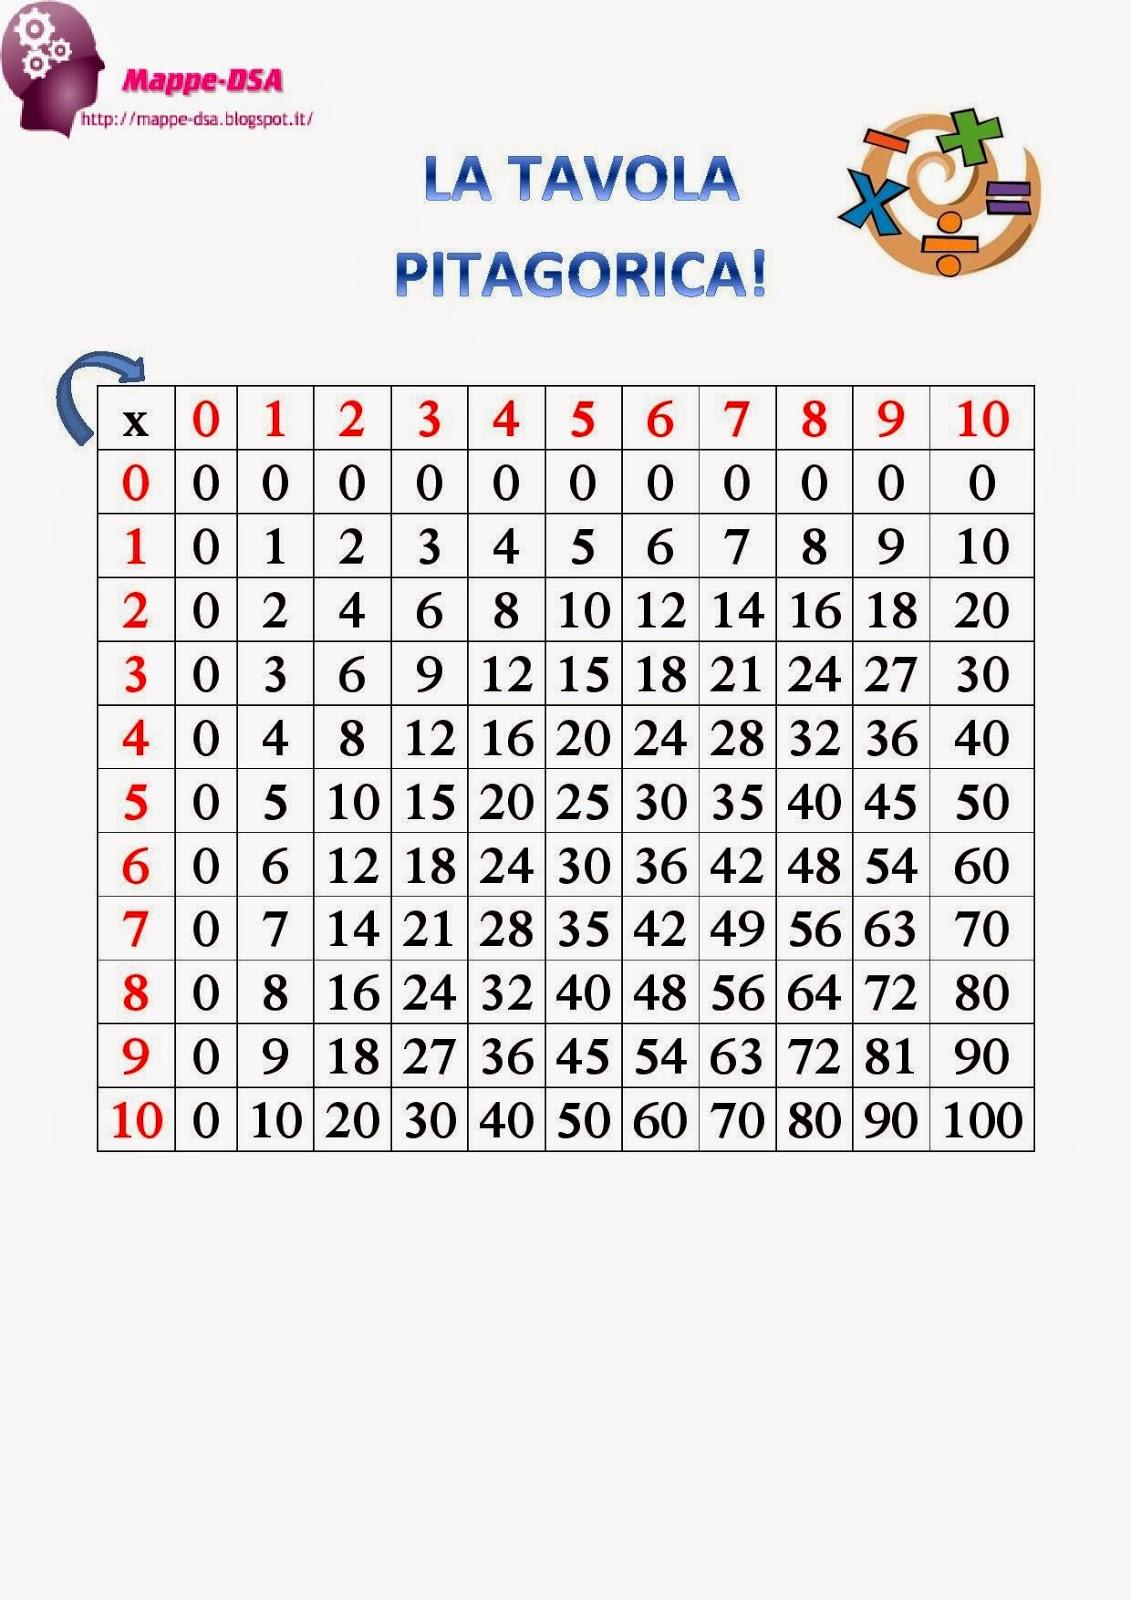 Mappe dsa - La tavola pitagorica da stampare ...